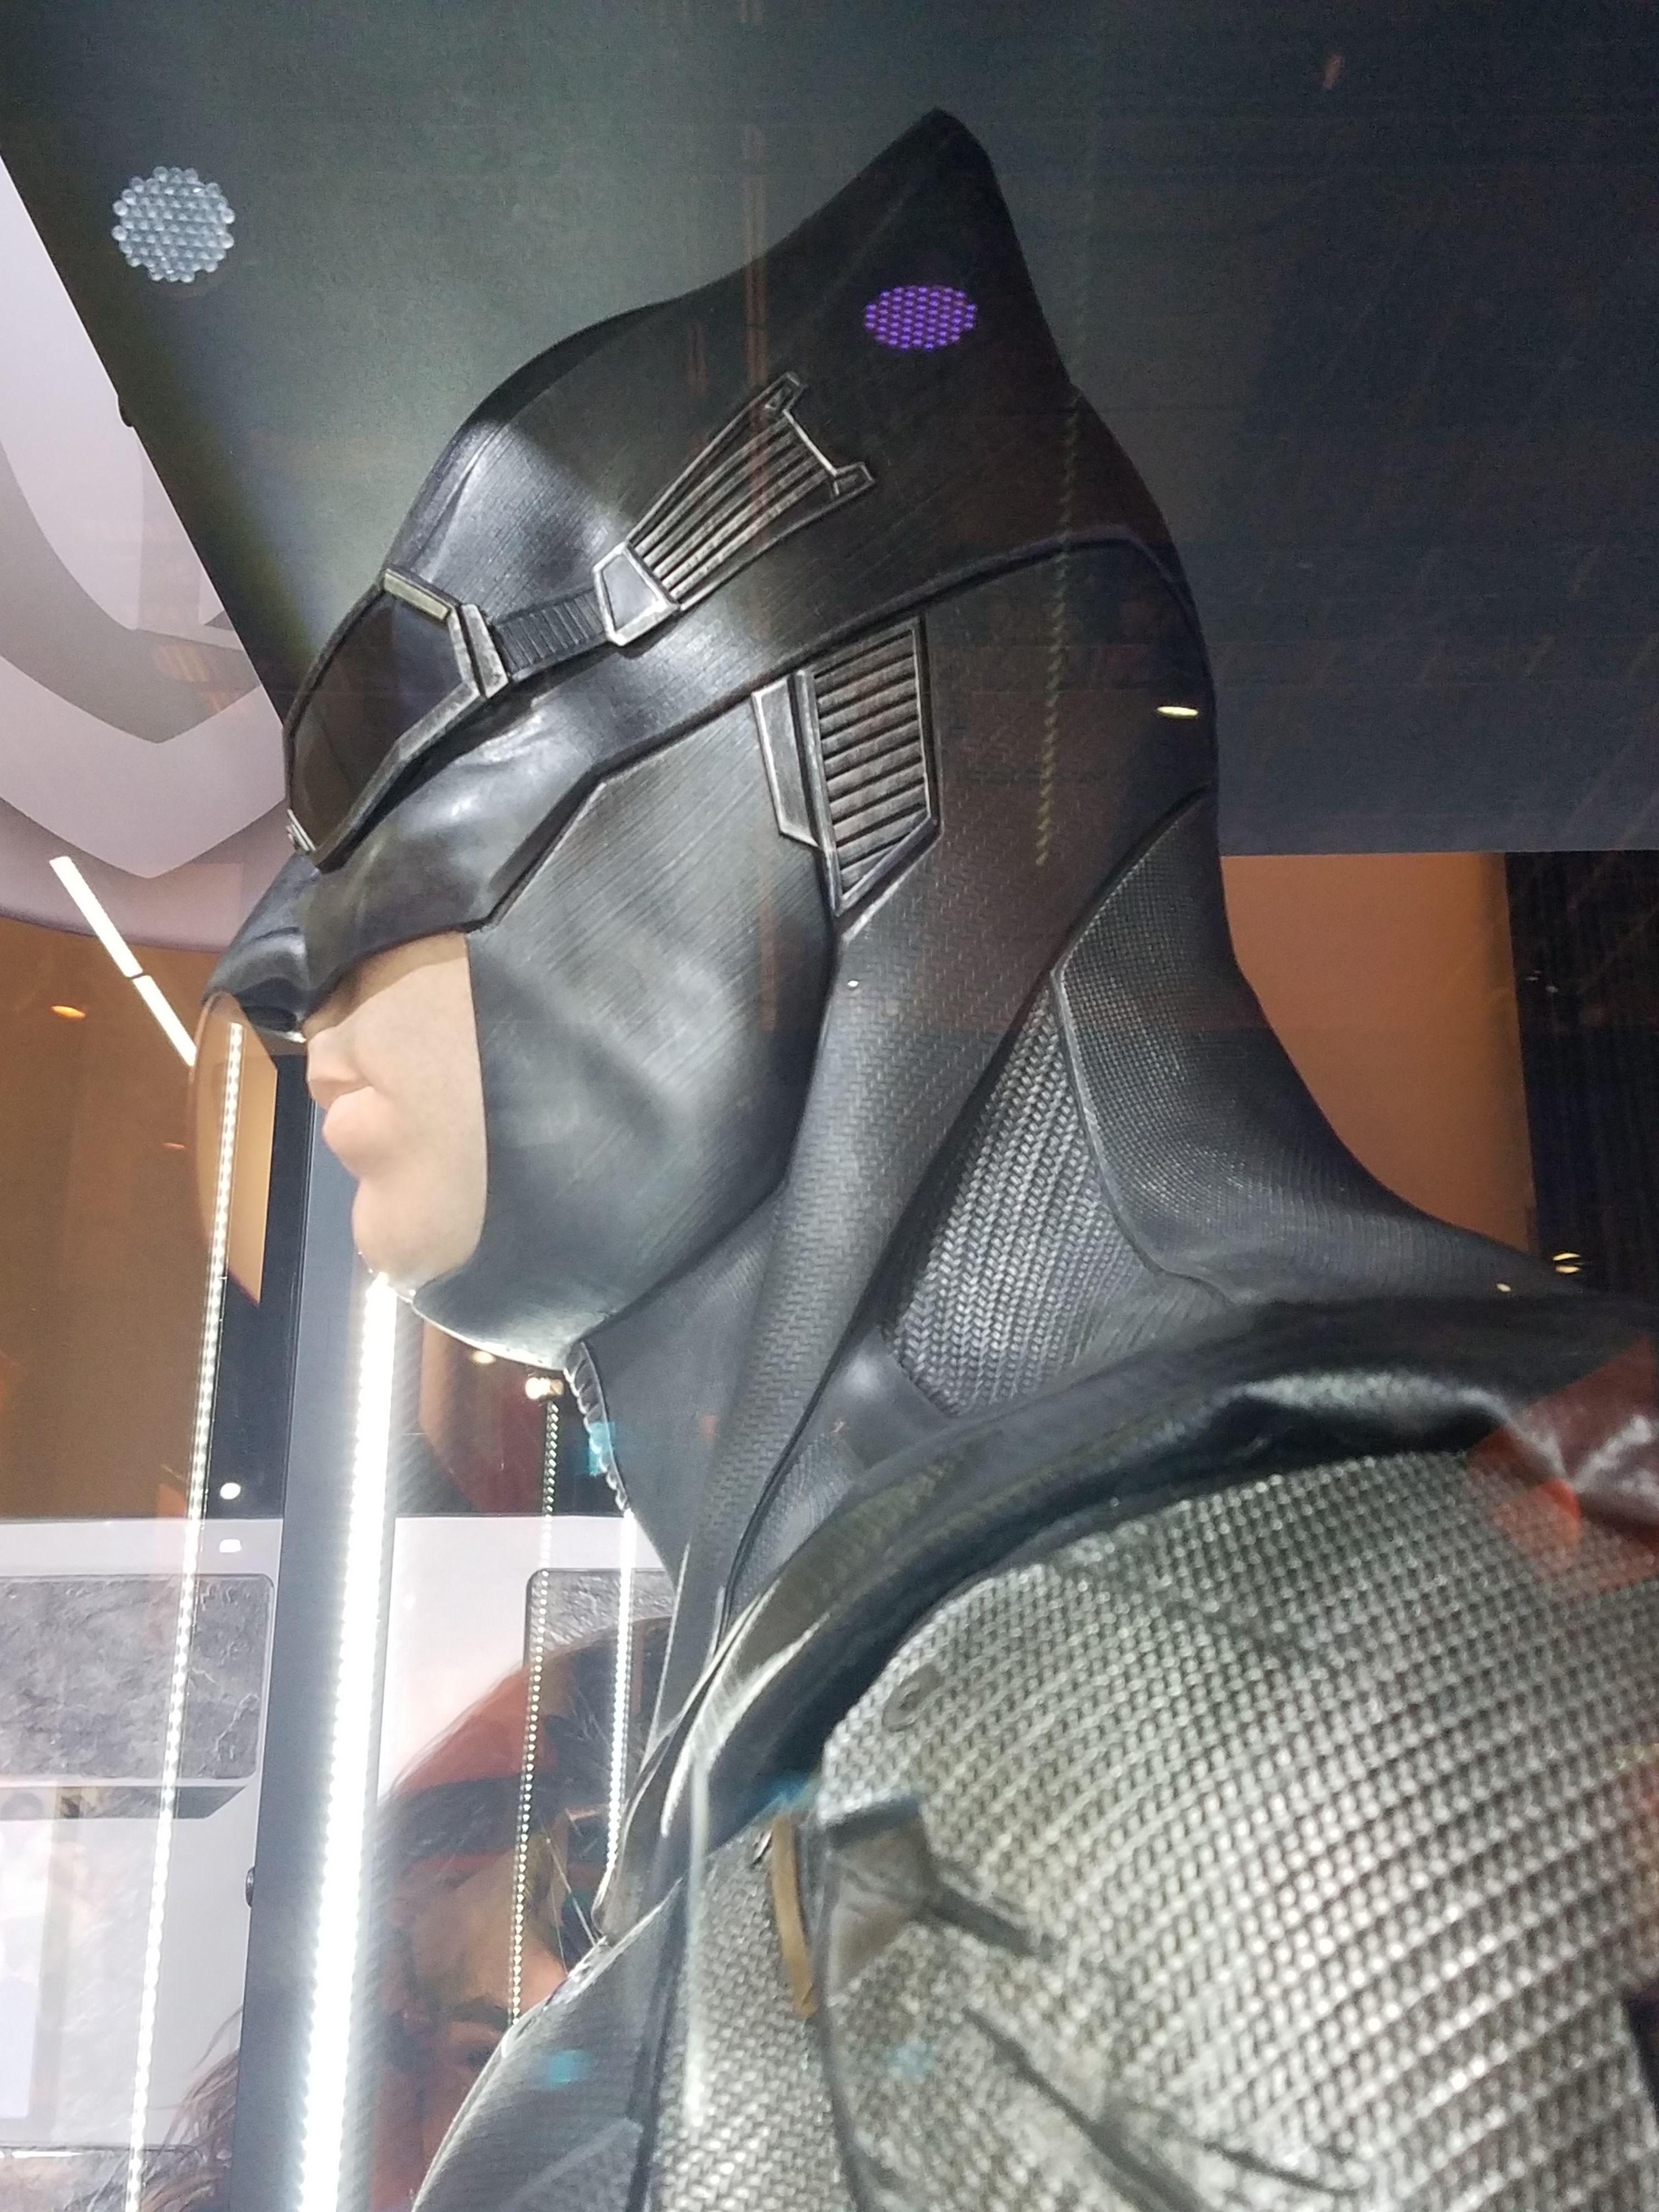 batman-costume-expo-image-6.jpg